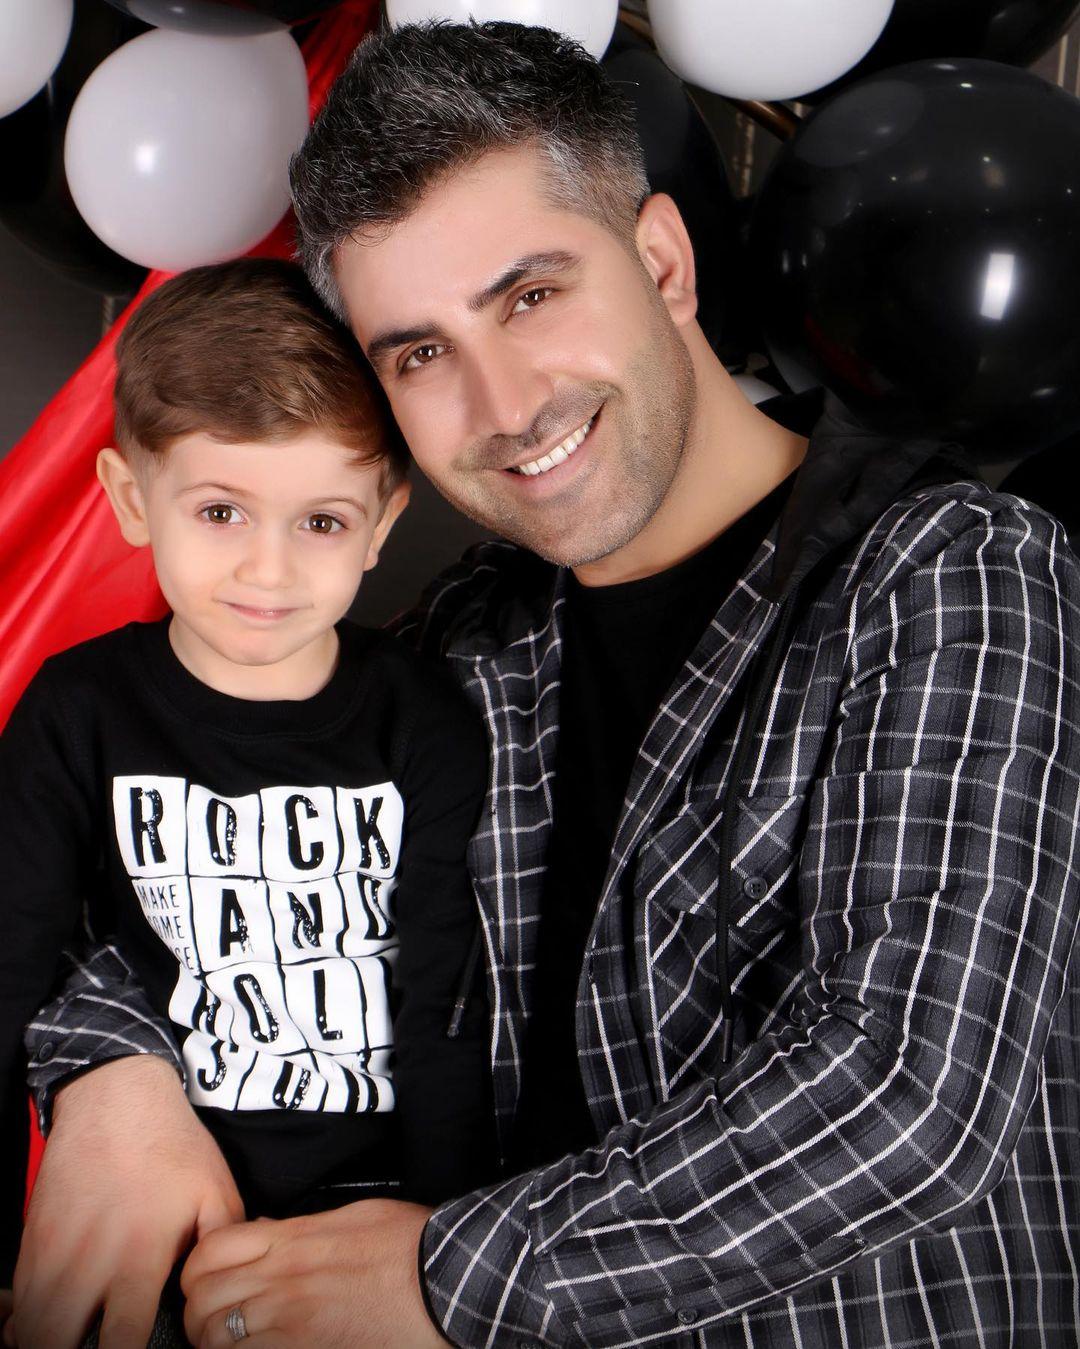 seccad mehmedi - بیوگرافی سجاد محمدی (تاتلیسس) خواننده + عکس و آهنگها